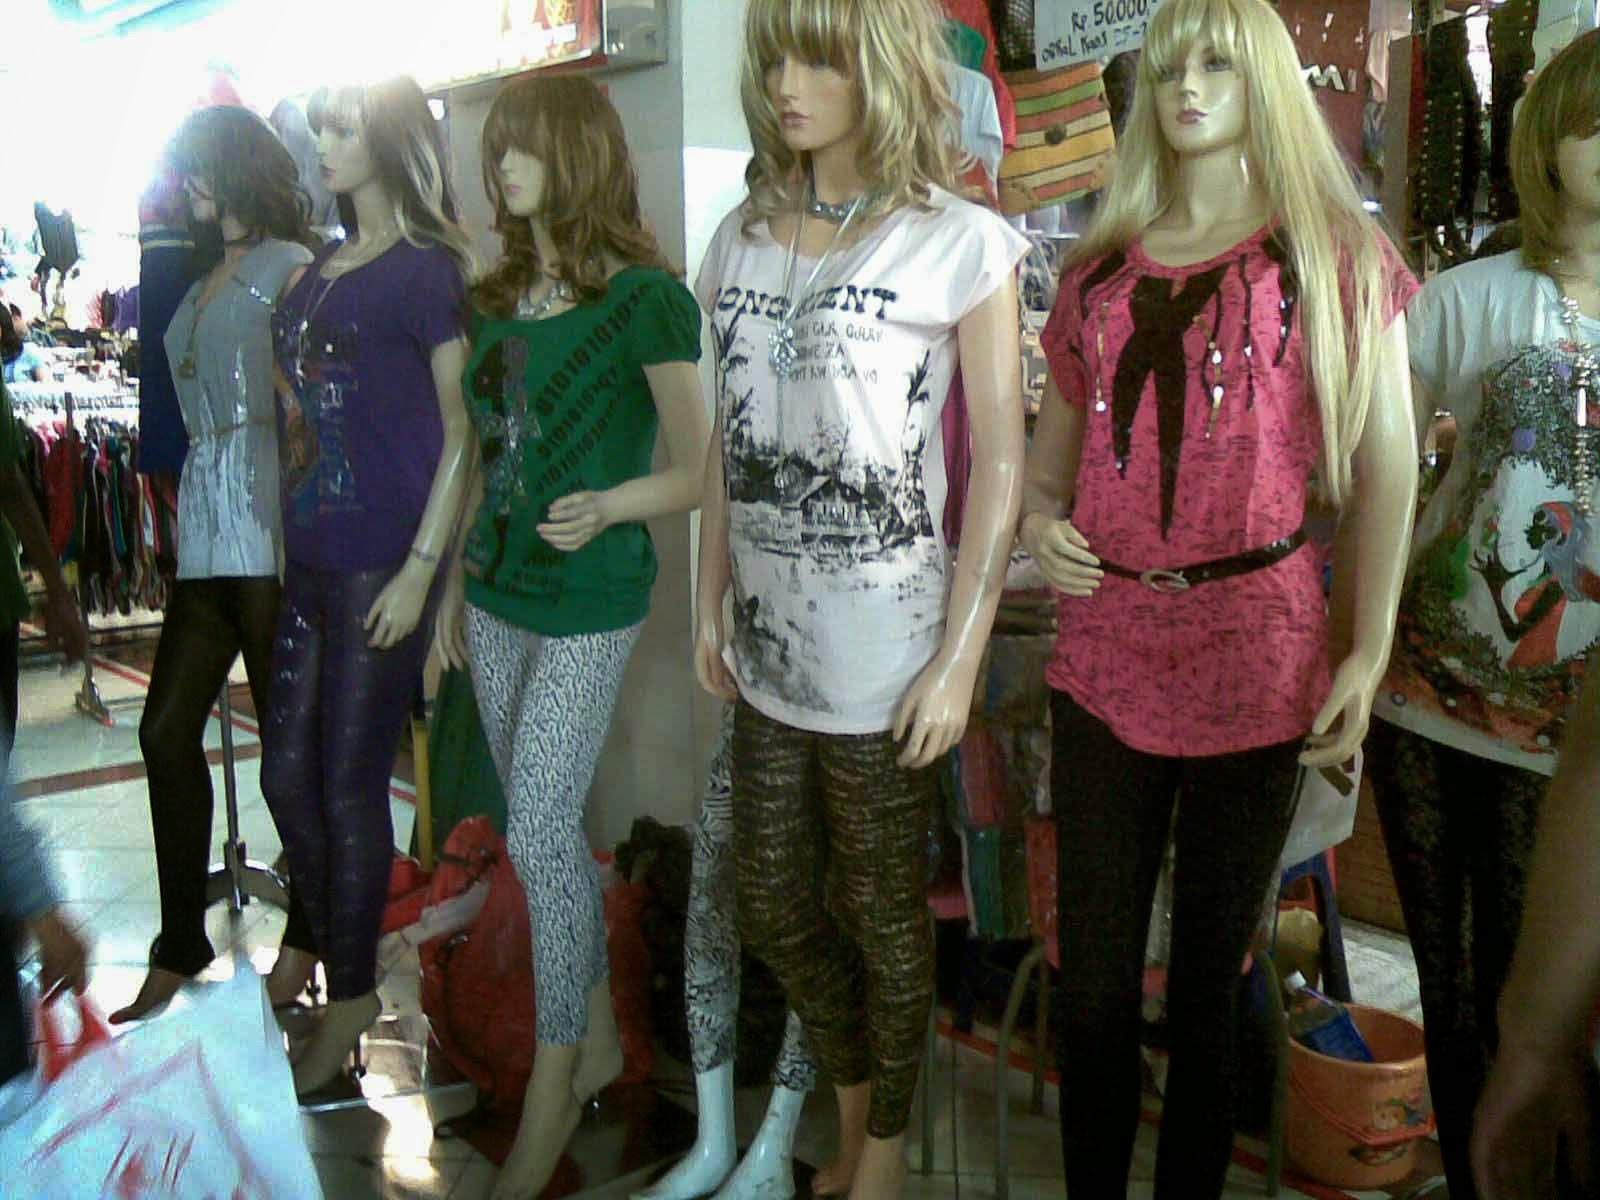 ... Murah Grosir Baju Muslim baju abang tanah grosir remaja Abang Tanah  Tanah Grosir Korea Baju Pasar Grosir Abang ... 0029ecc6dc